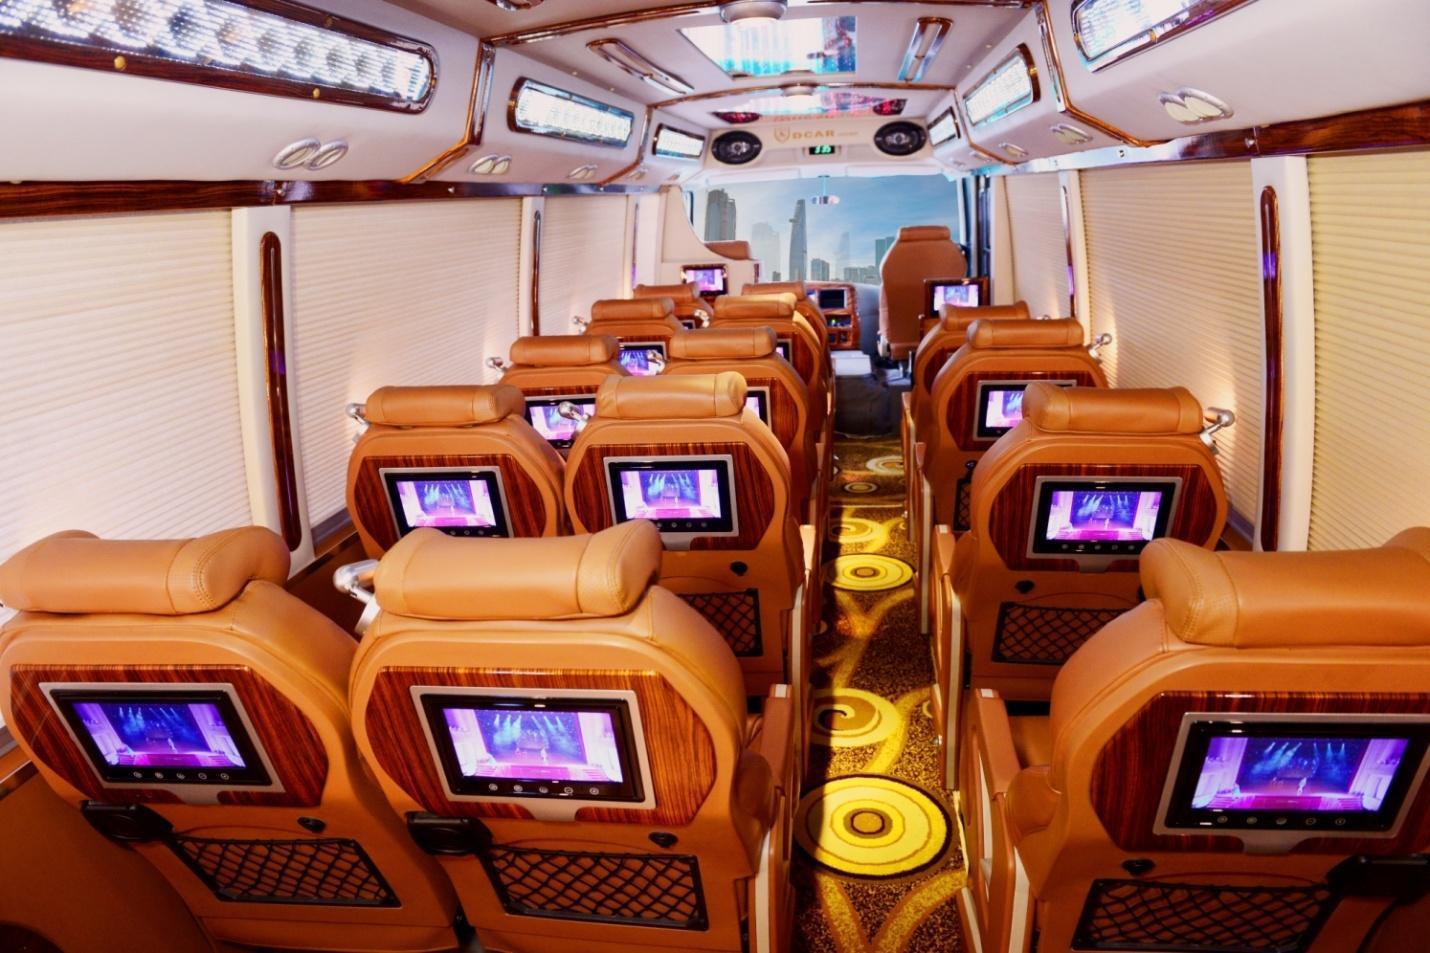 http://dongalimousine.com/wp-content/uploads/2017/12/thue-xe-limousine-16-cho-19-cho-fuso-3.jpg